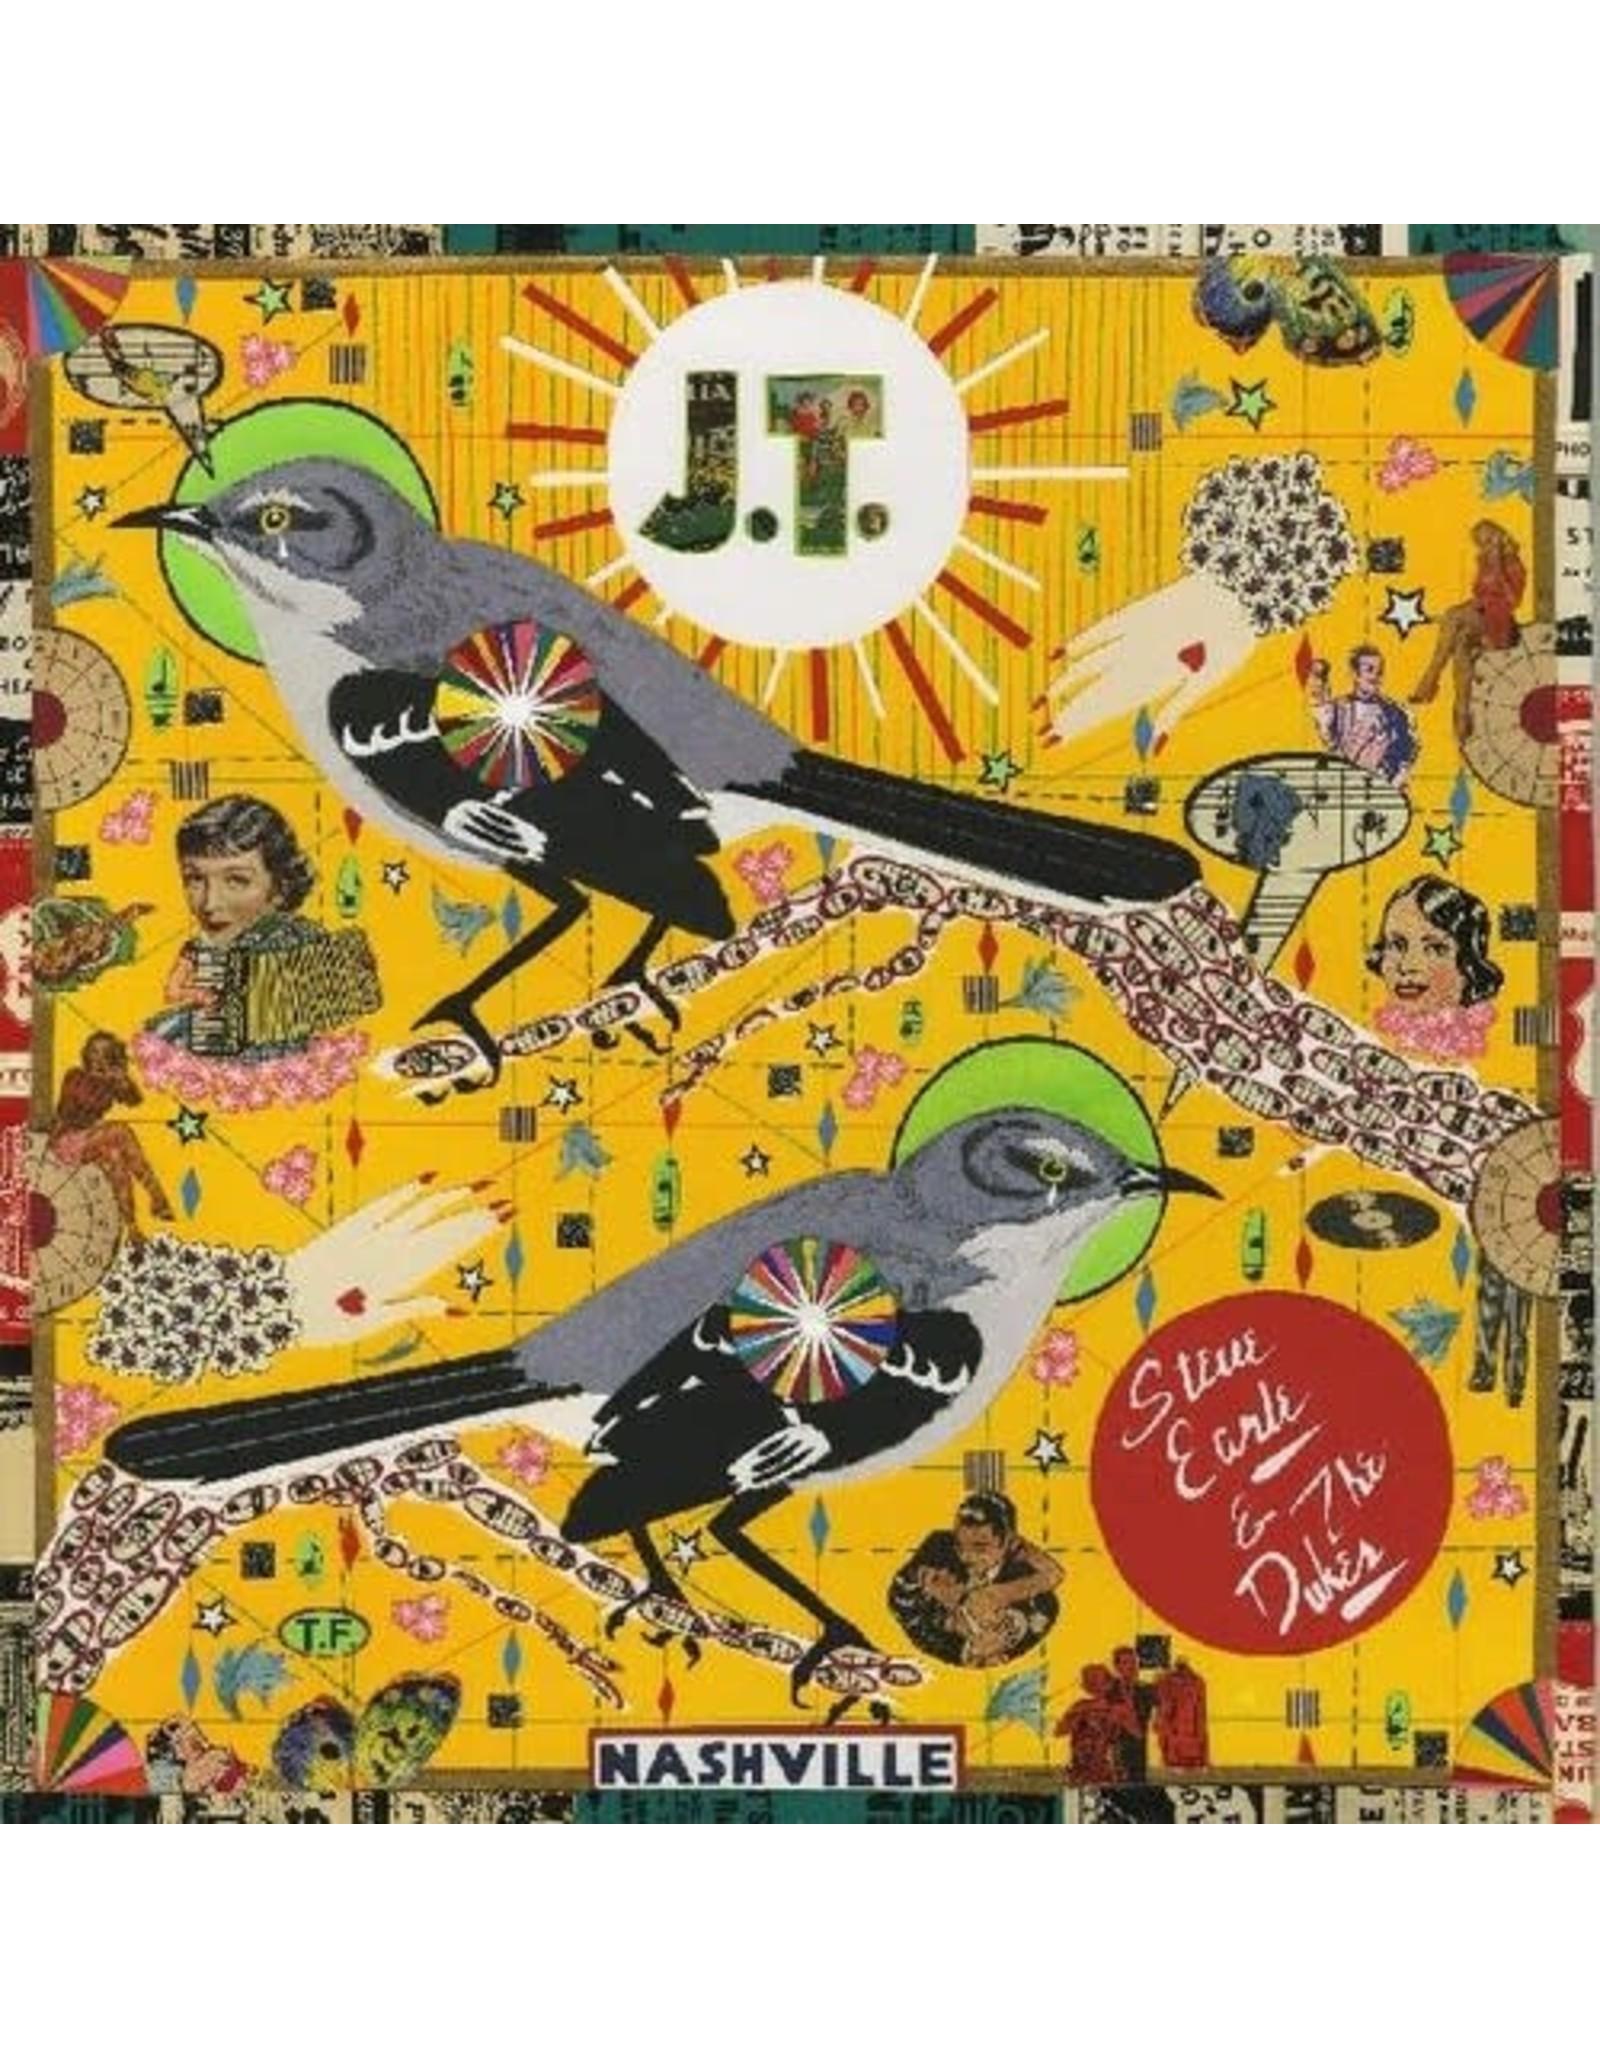 Earle, Steve / JT (Colored Vinyl)